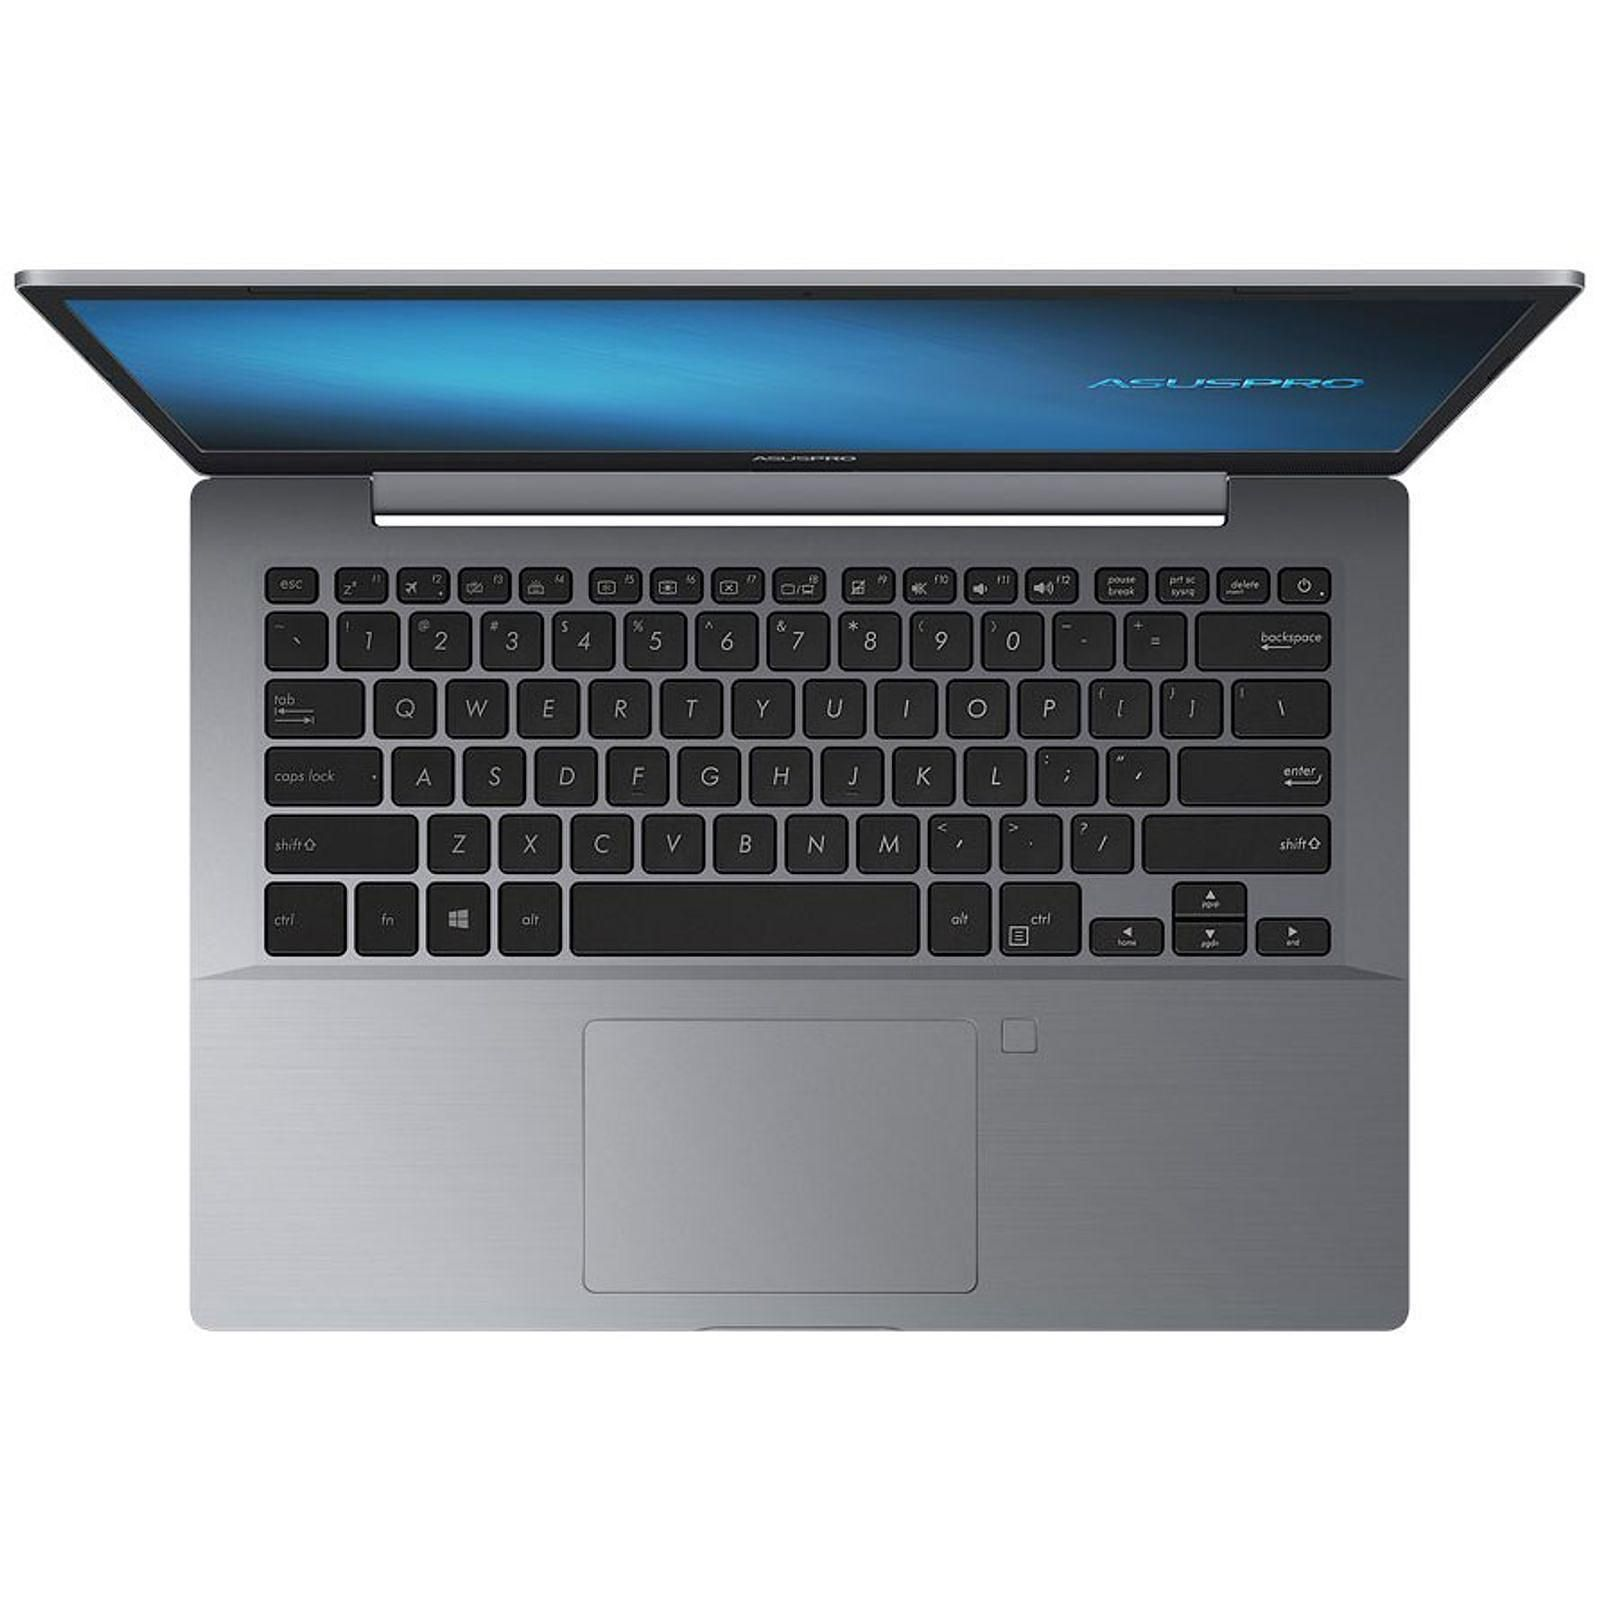 Asus 90NX01X1-M07820 - PC portable Asus - Cybertek.fr - 3